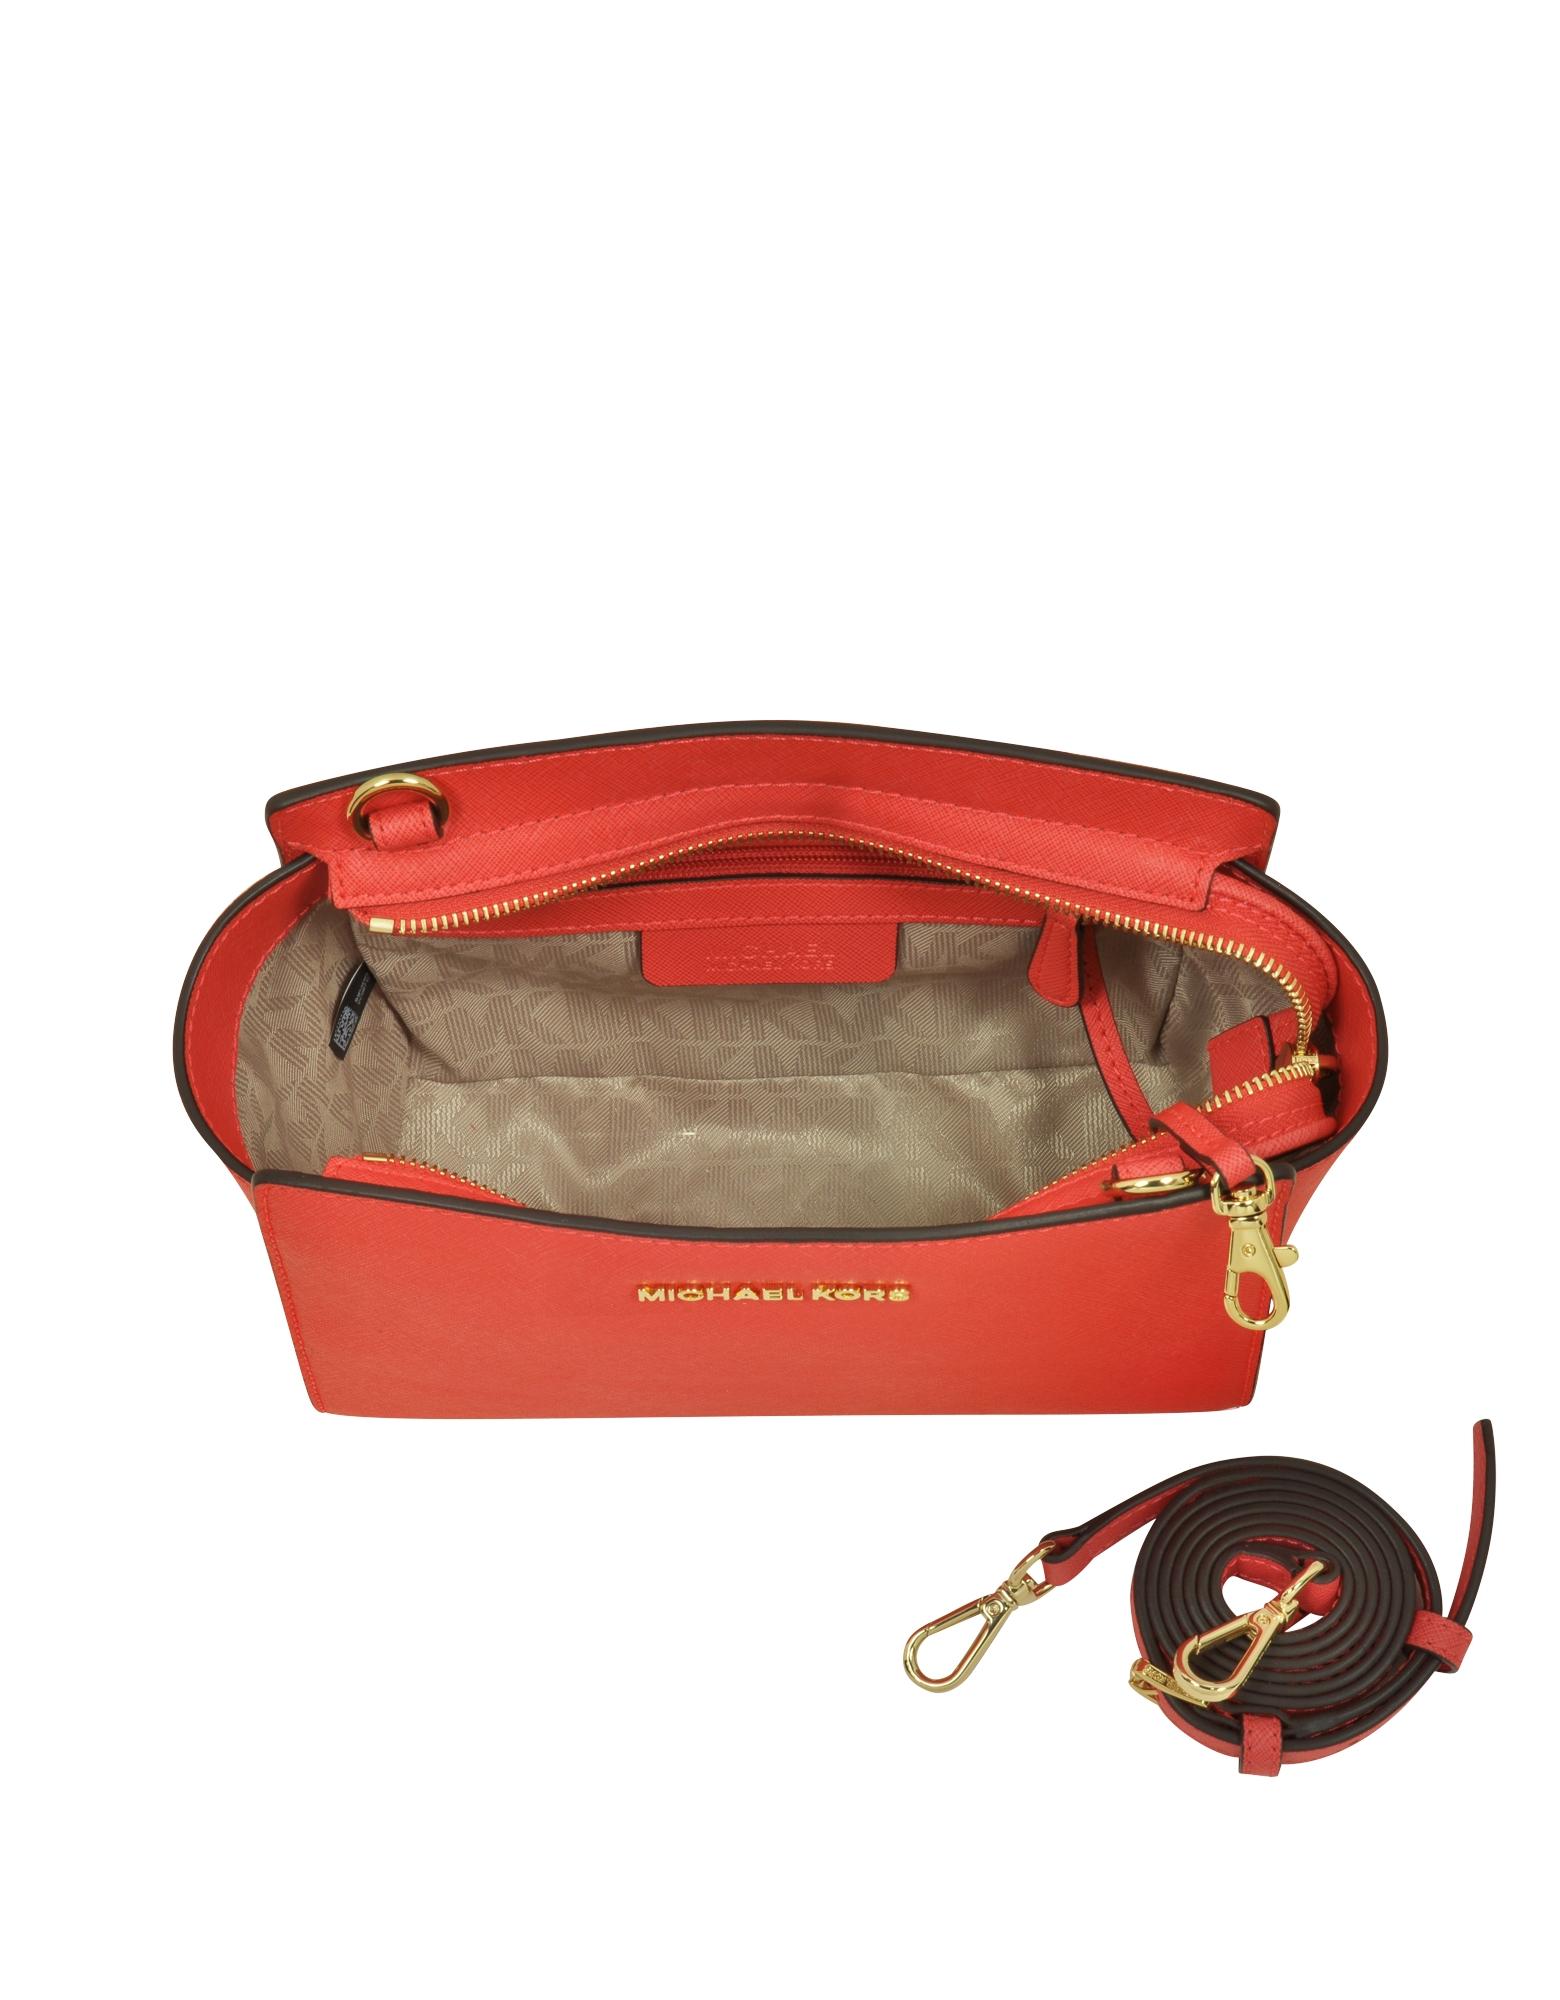 2397f502753e ... promo code for michael kors selma medium coral reef saffiano leather  messenger bag 51b36 25325